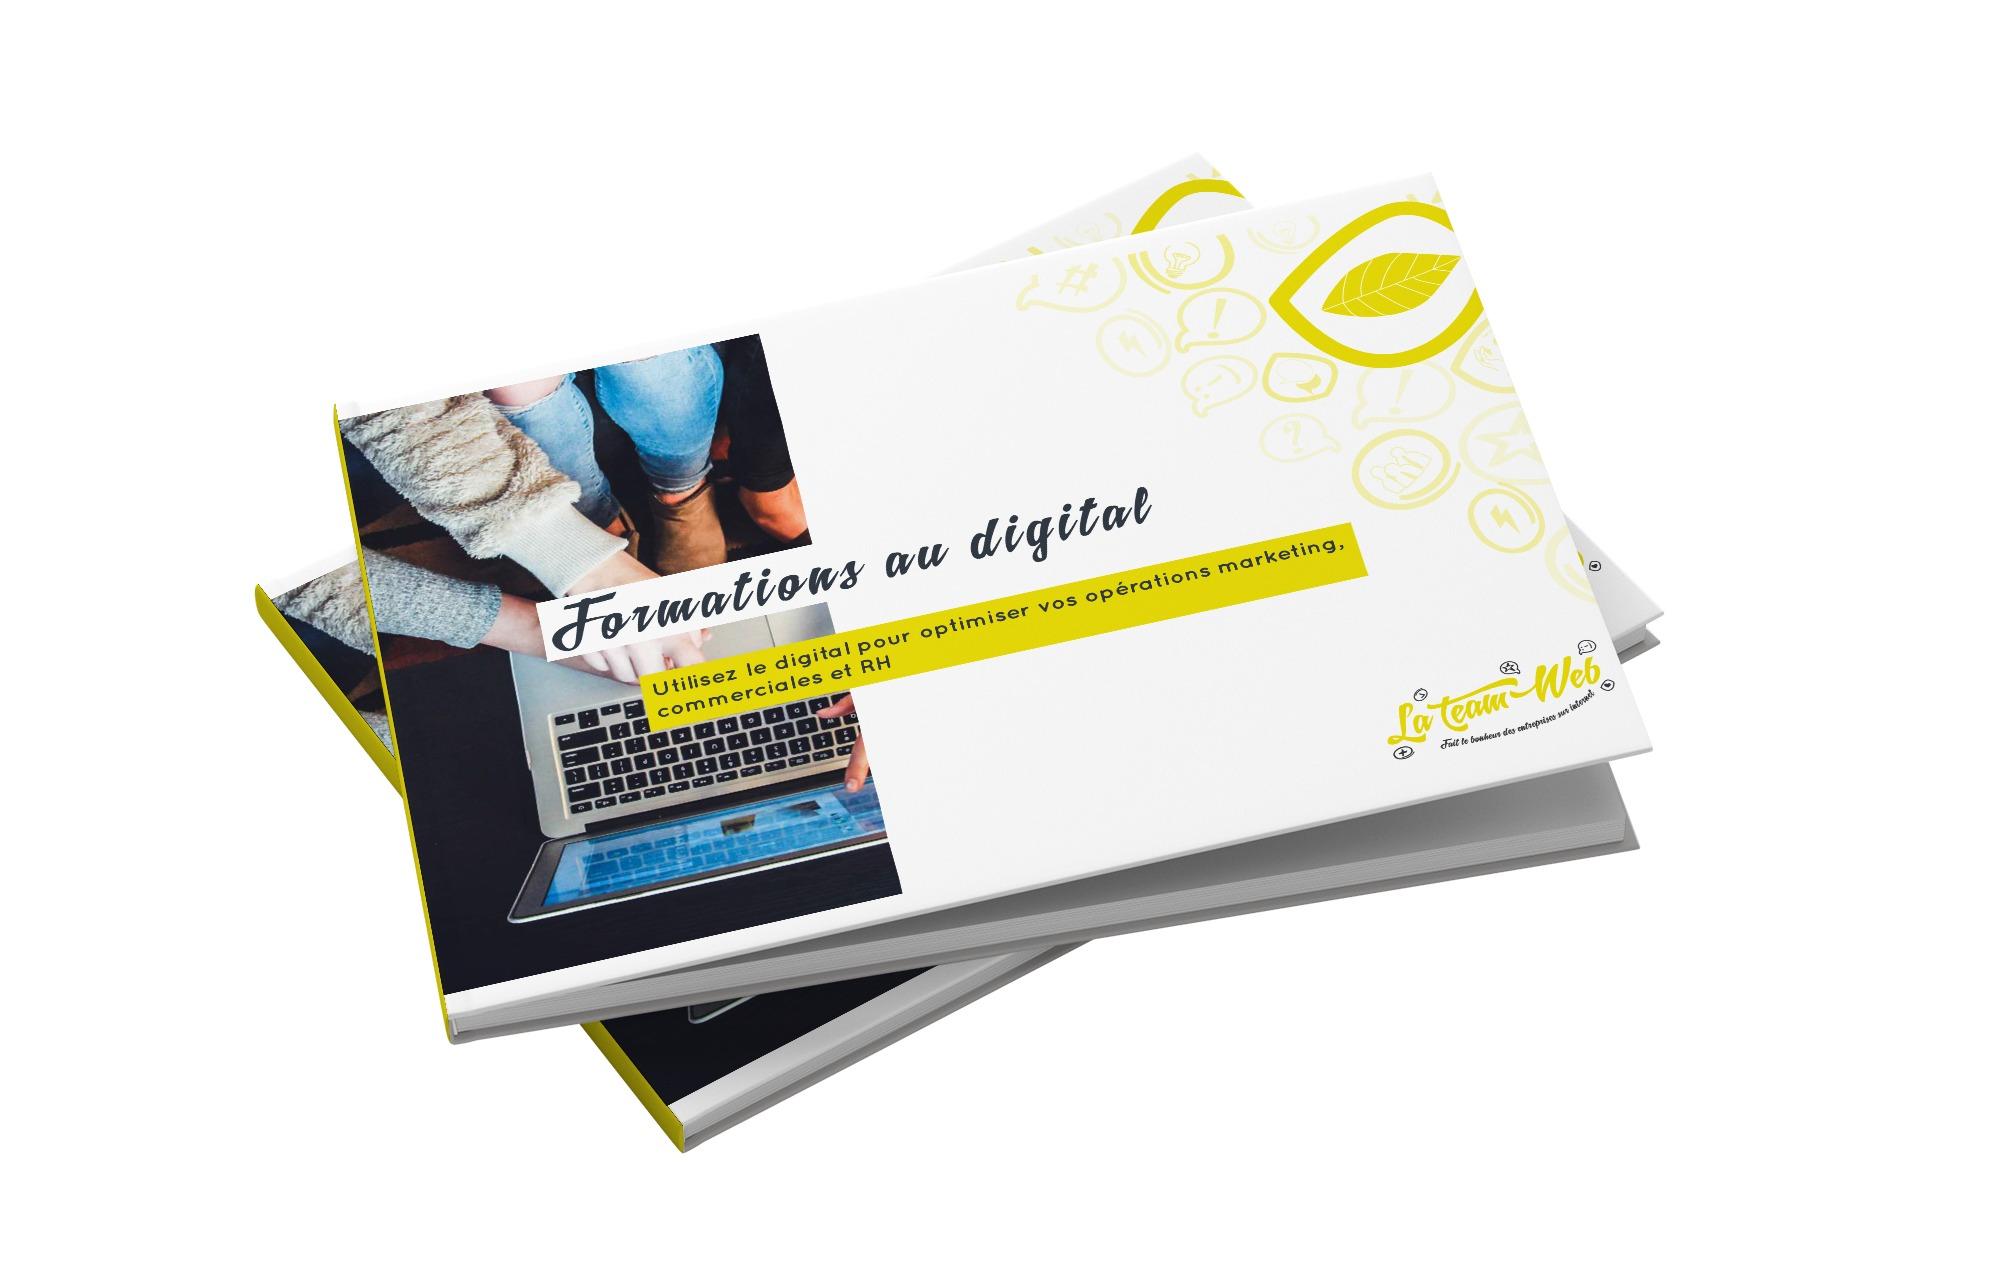 Catalogue de Formations au Digital